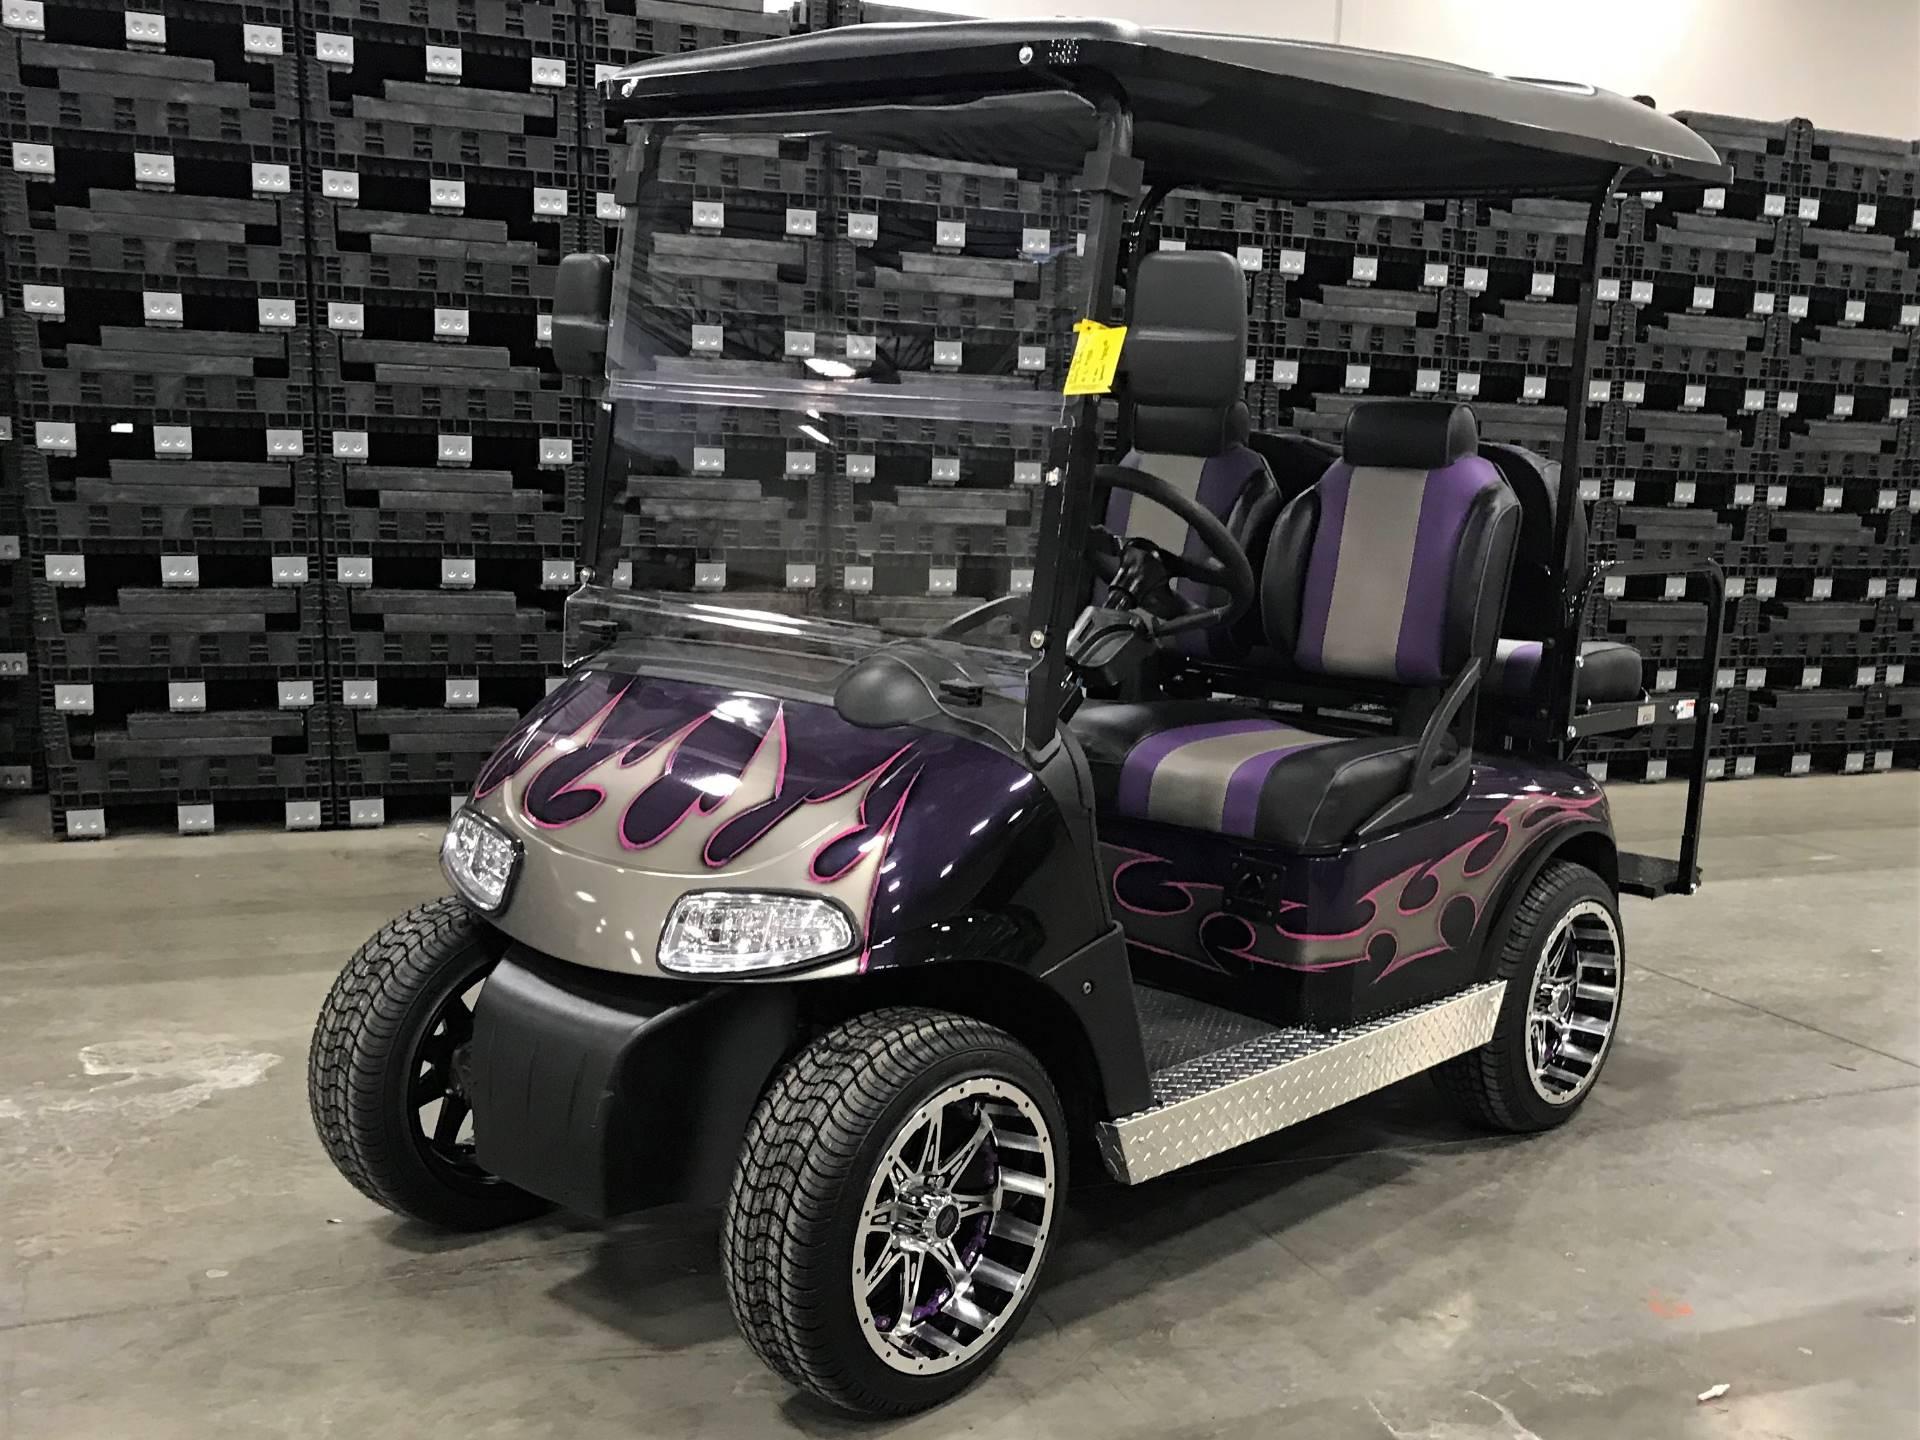 2013 e z go rxv golf carts otsego minnesota 5162617 2013 e z go rxv in otsego minnesota sciox Gallery